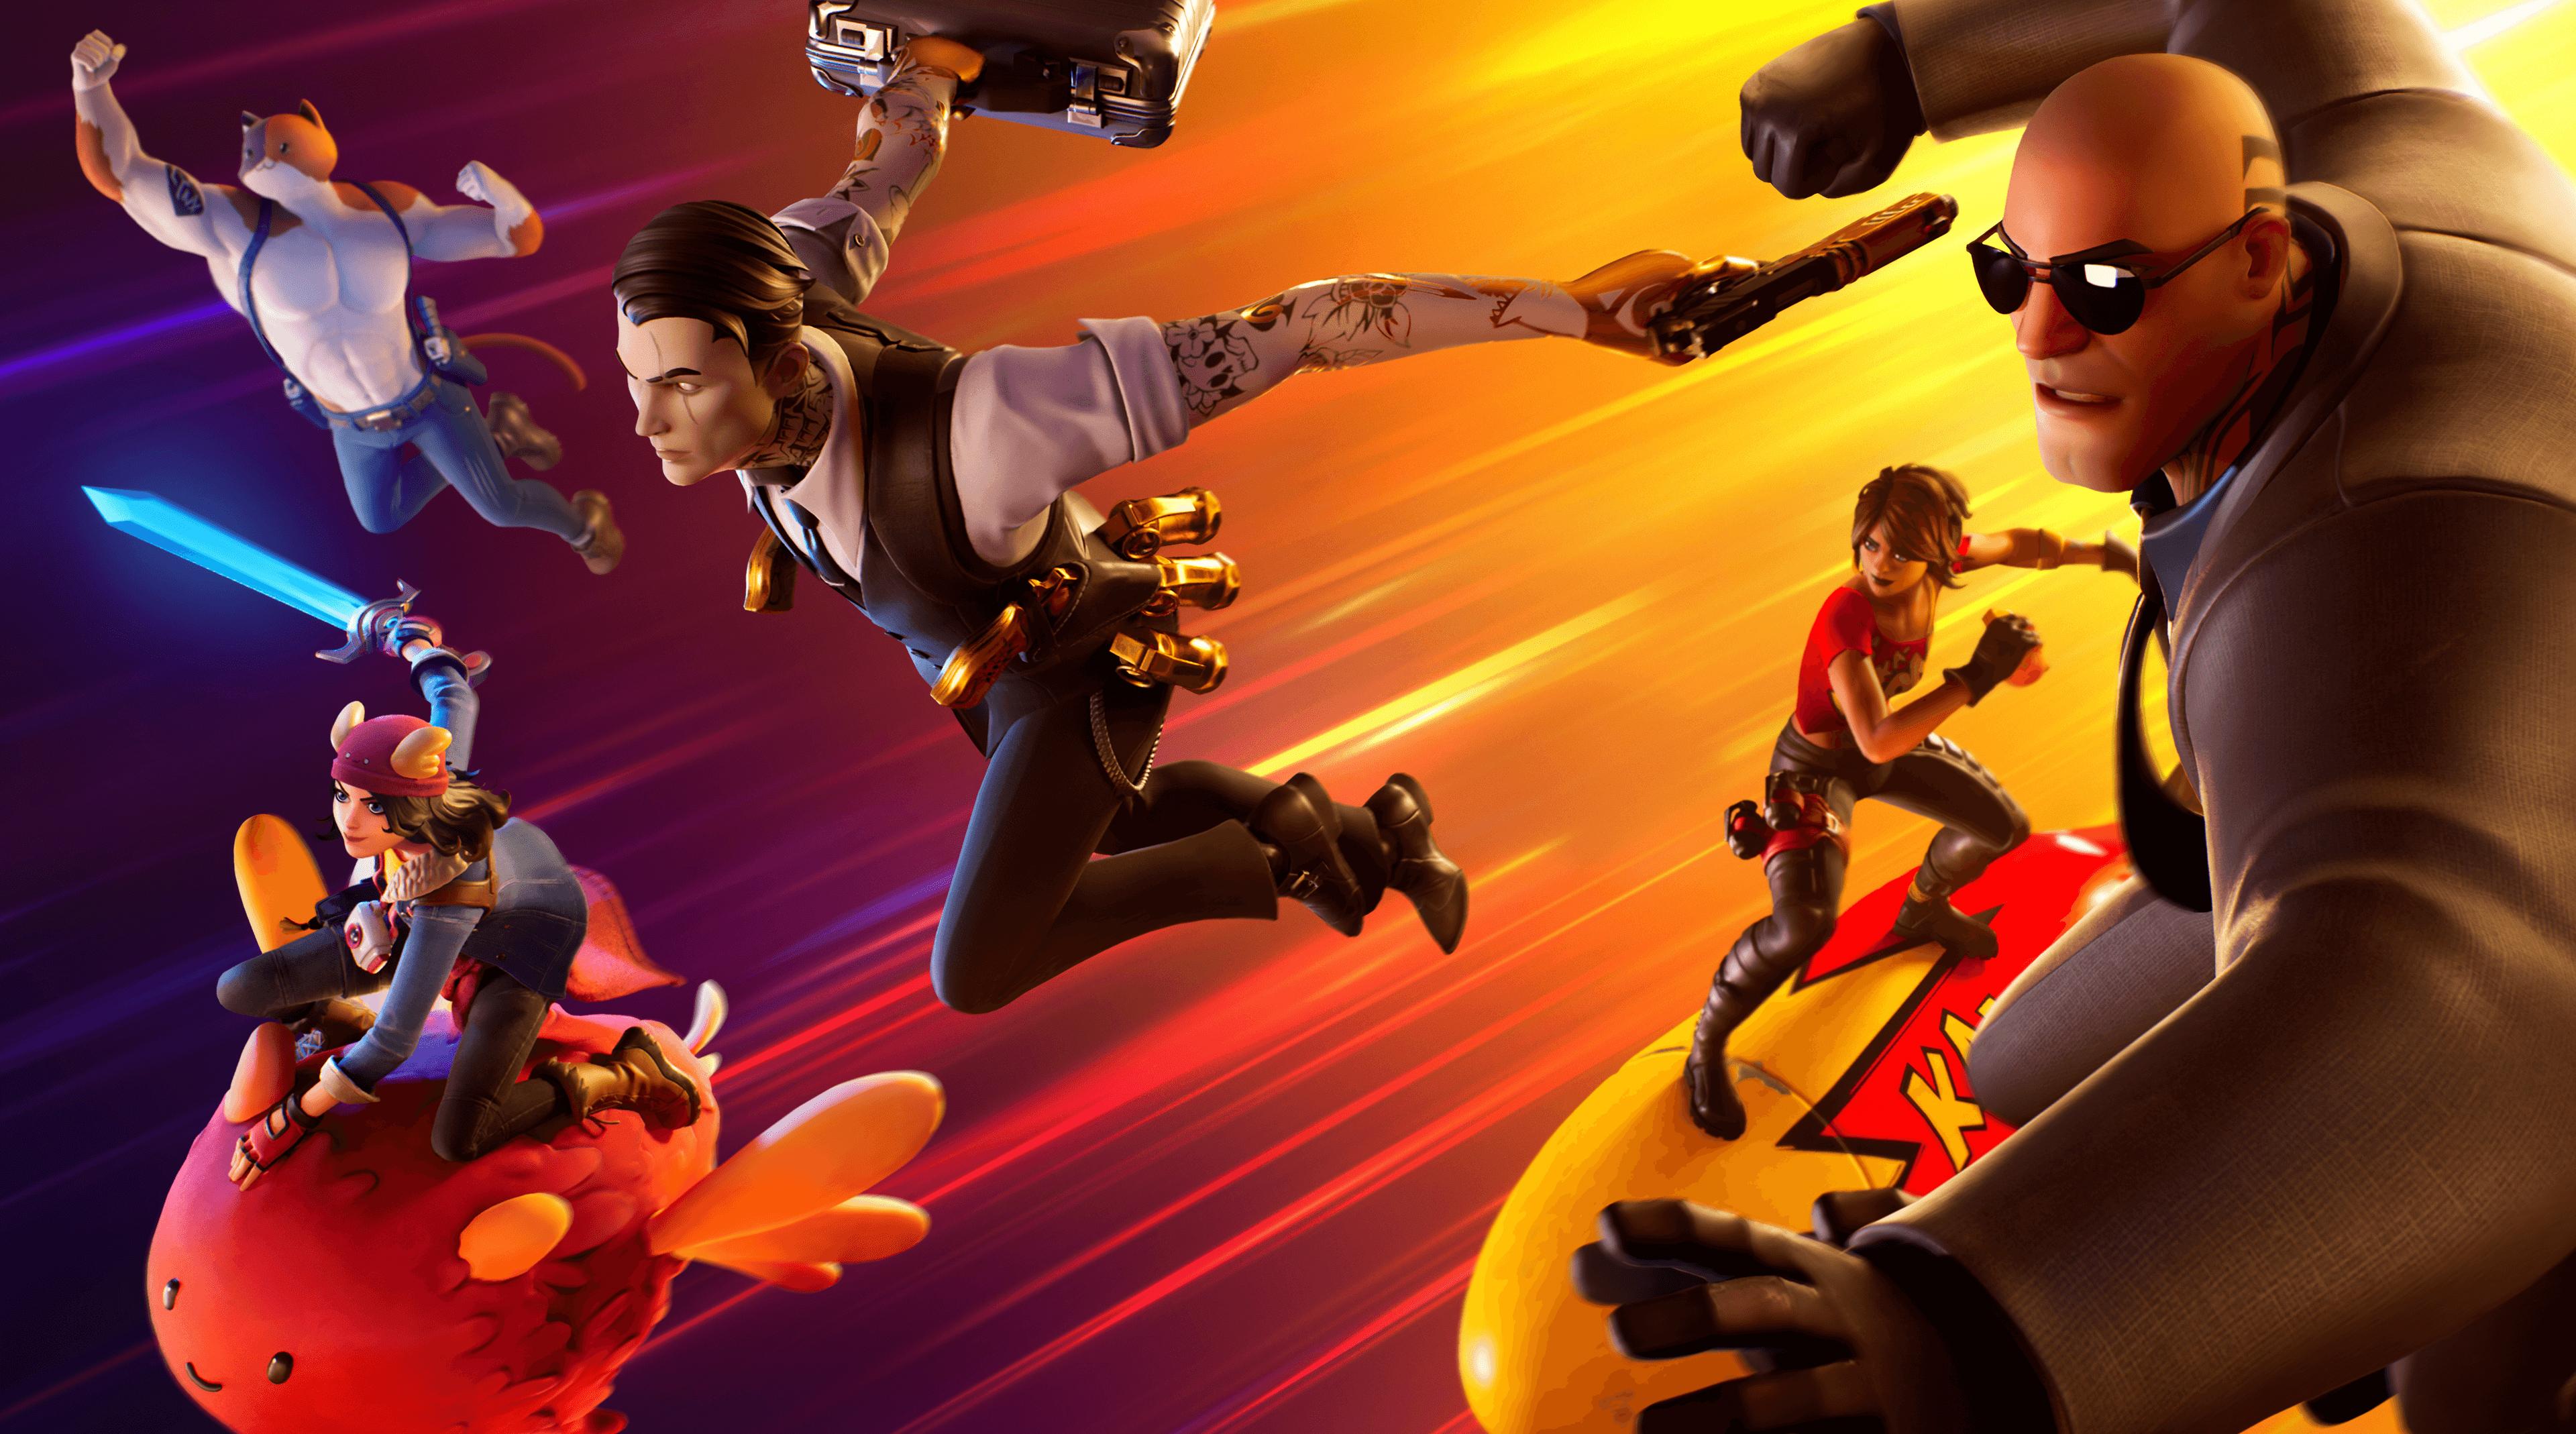 2020 Fortnite 4k, HD Games, 4k Wallpapers, Images ...